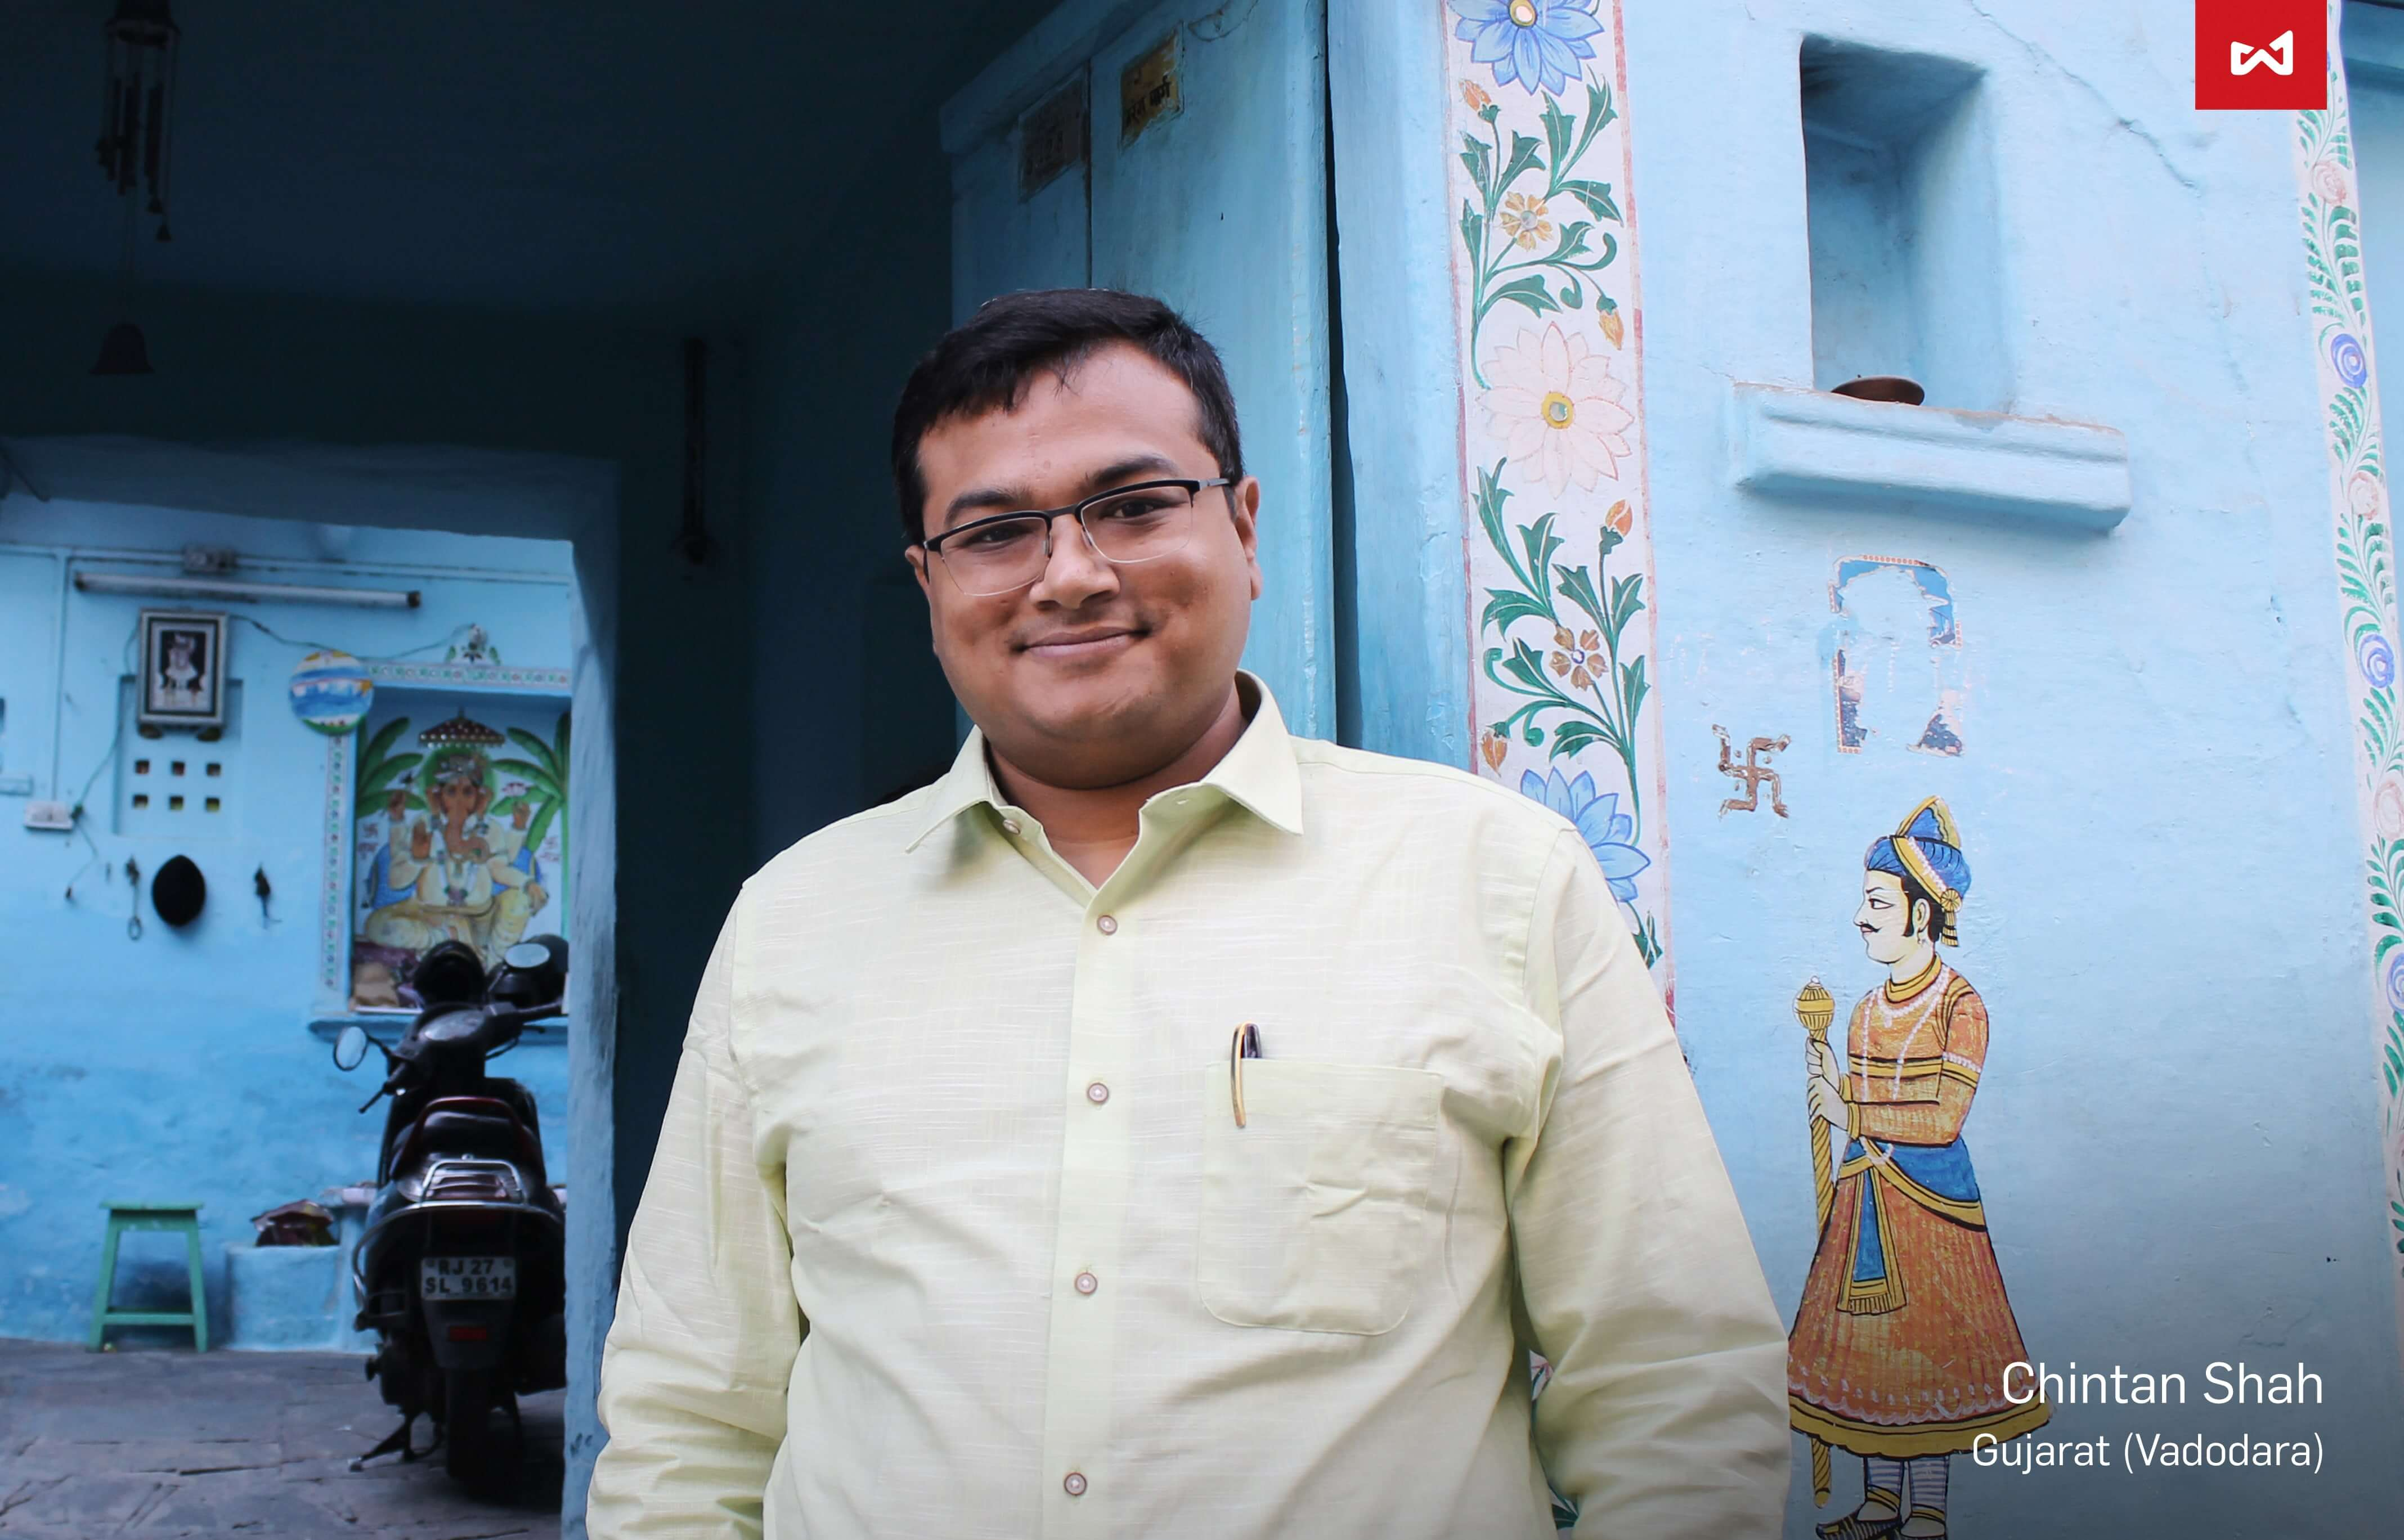 Chintan Shah